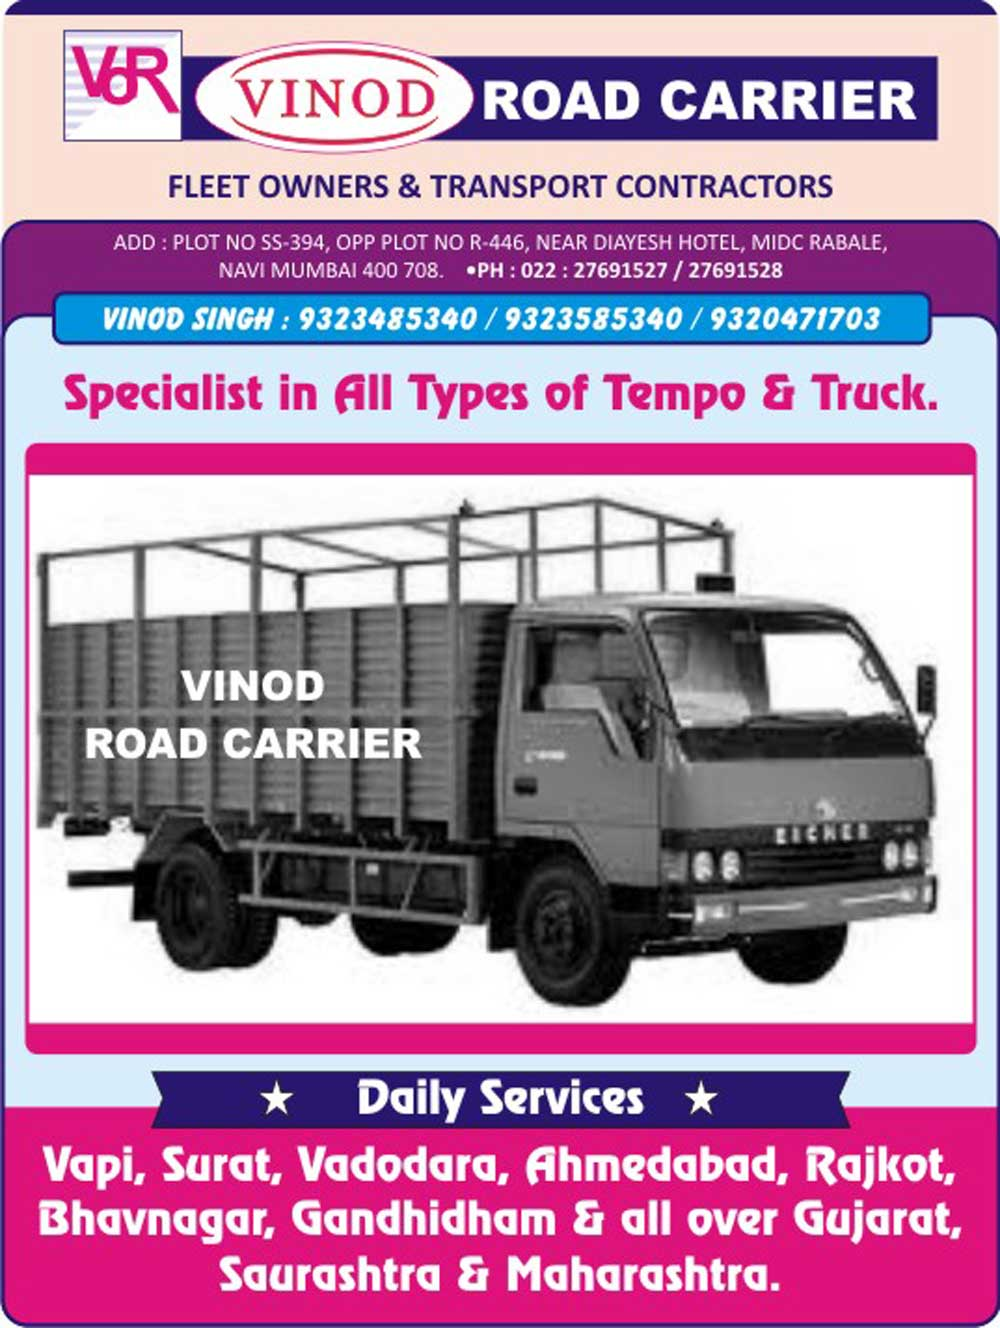 Vinod Road Carrier